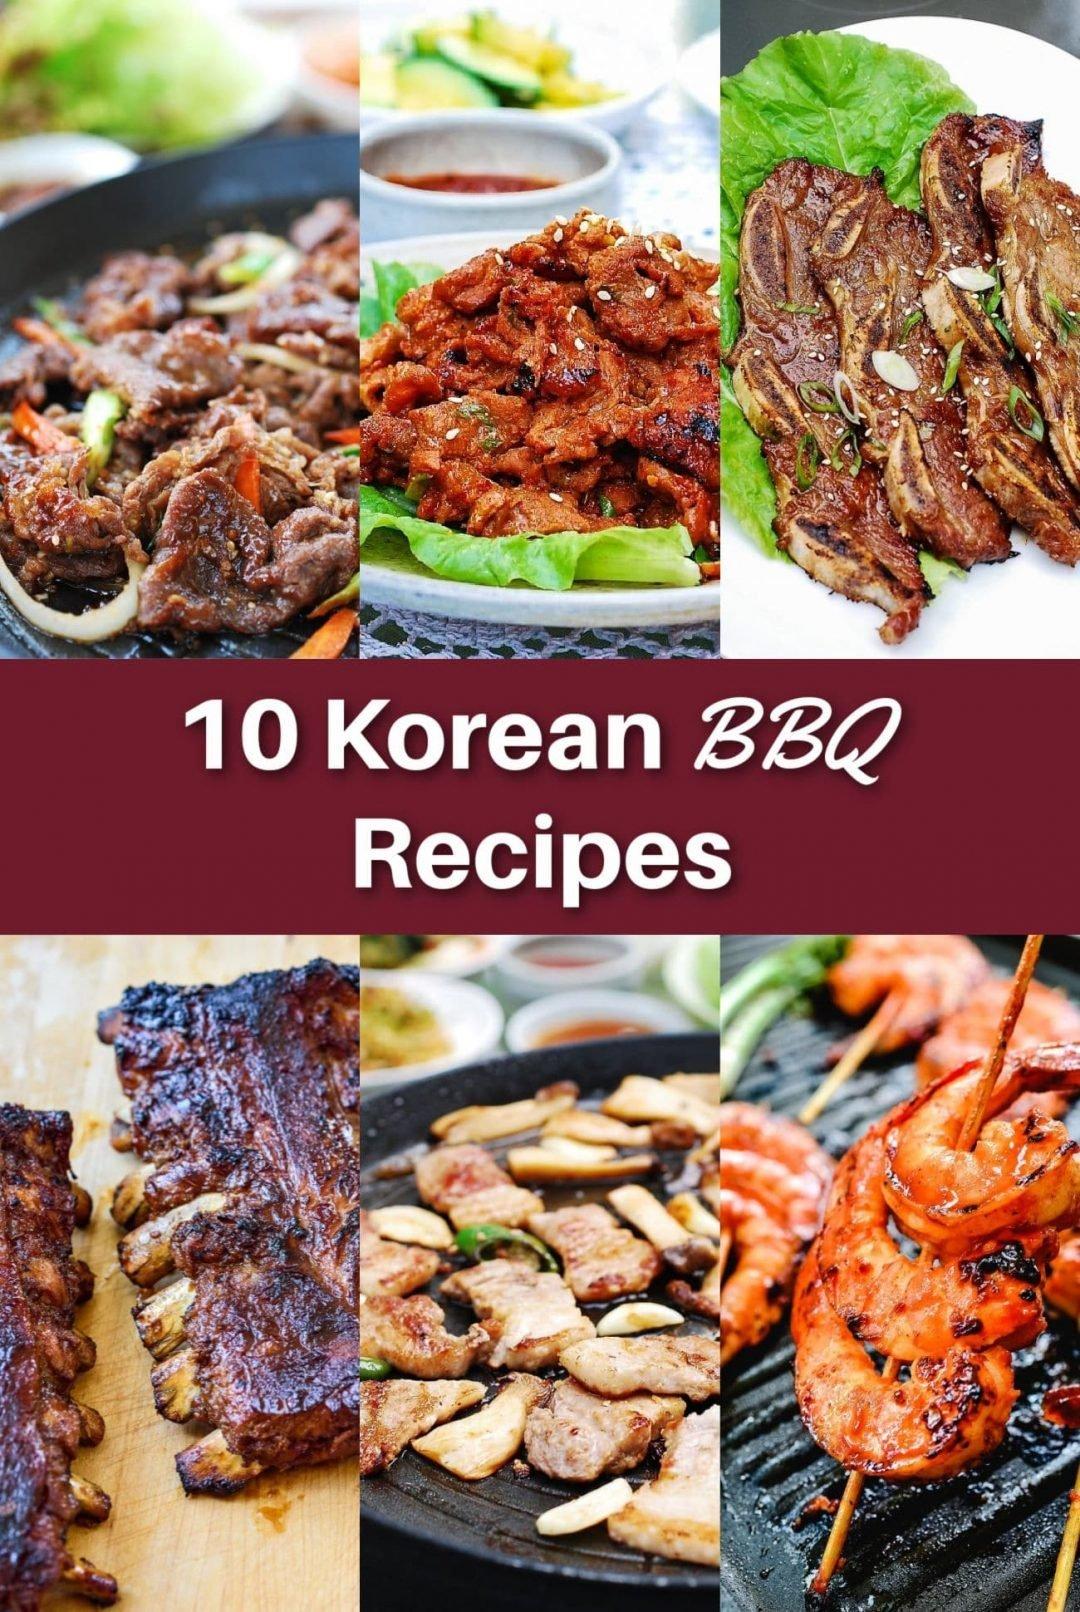 Blank 1300 x 1940 3 e1621703194574 - A Korean Mom's Cooking